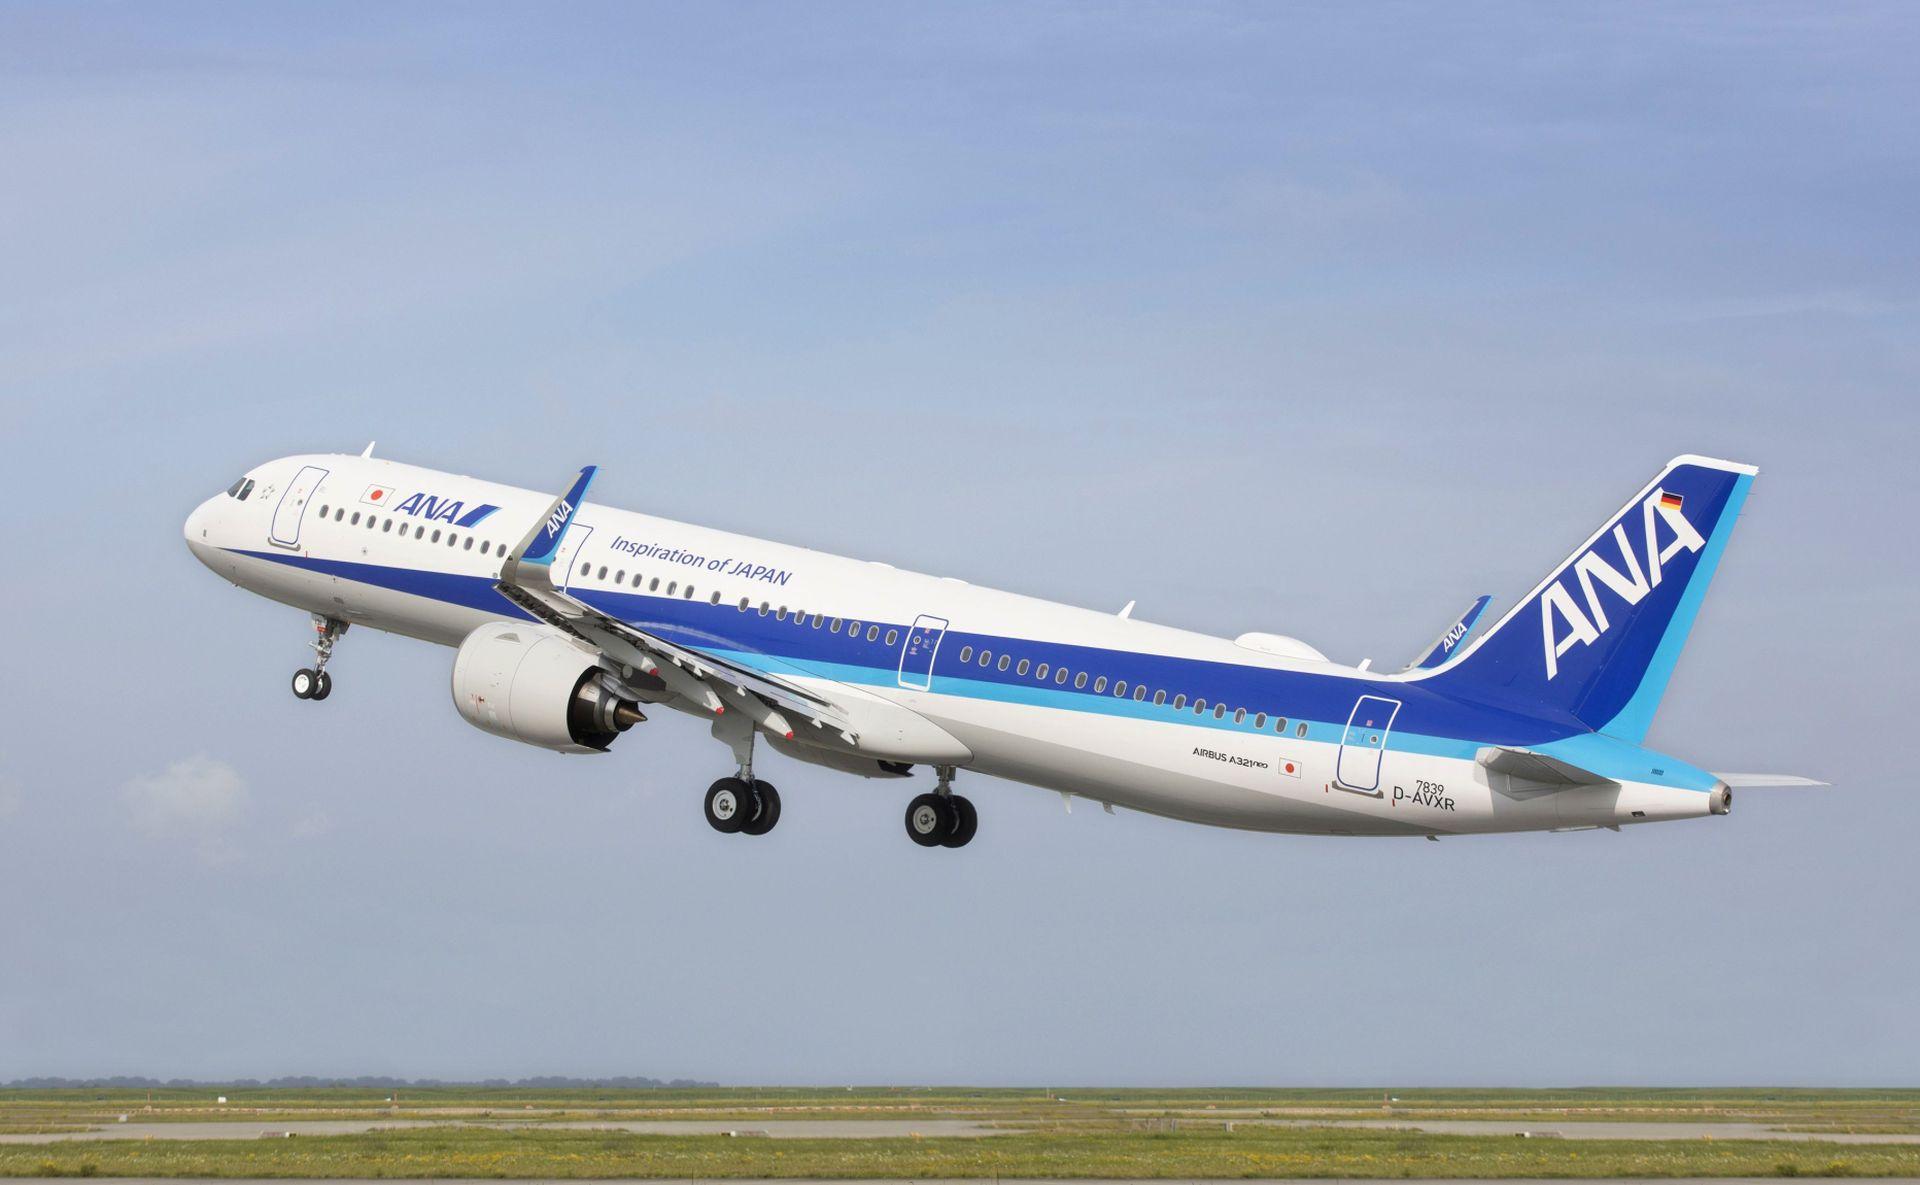 Airbus A321neo společnosti All Nippon Airways. Foto: Airbus